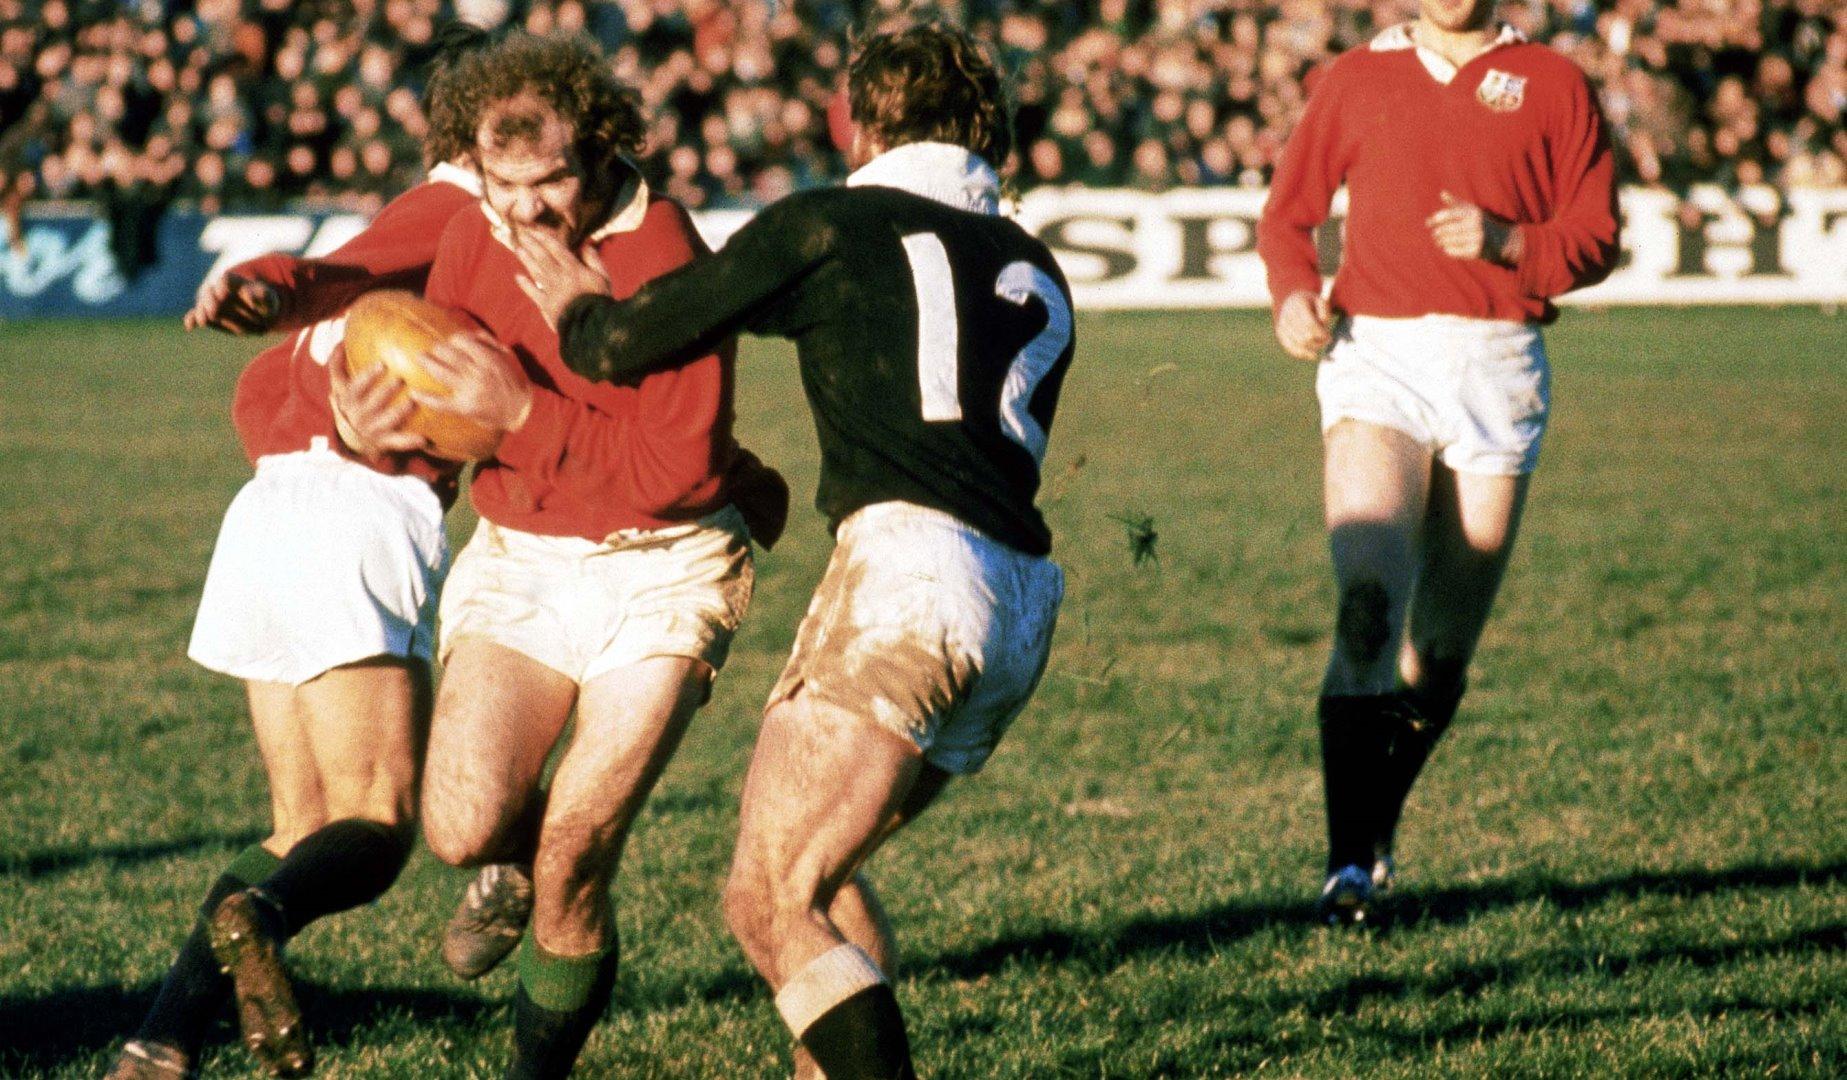 Lions Hero: John Taylor on Cliff Morgan